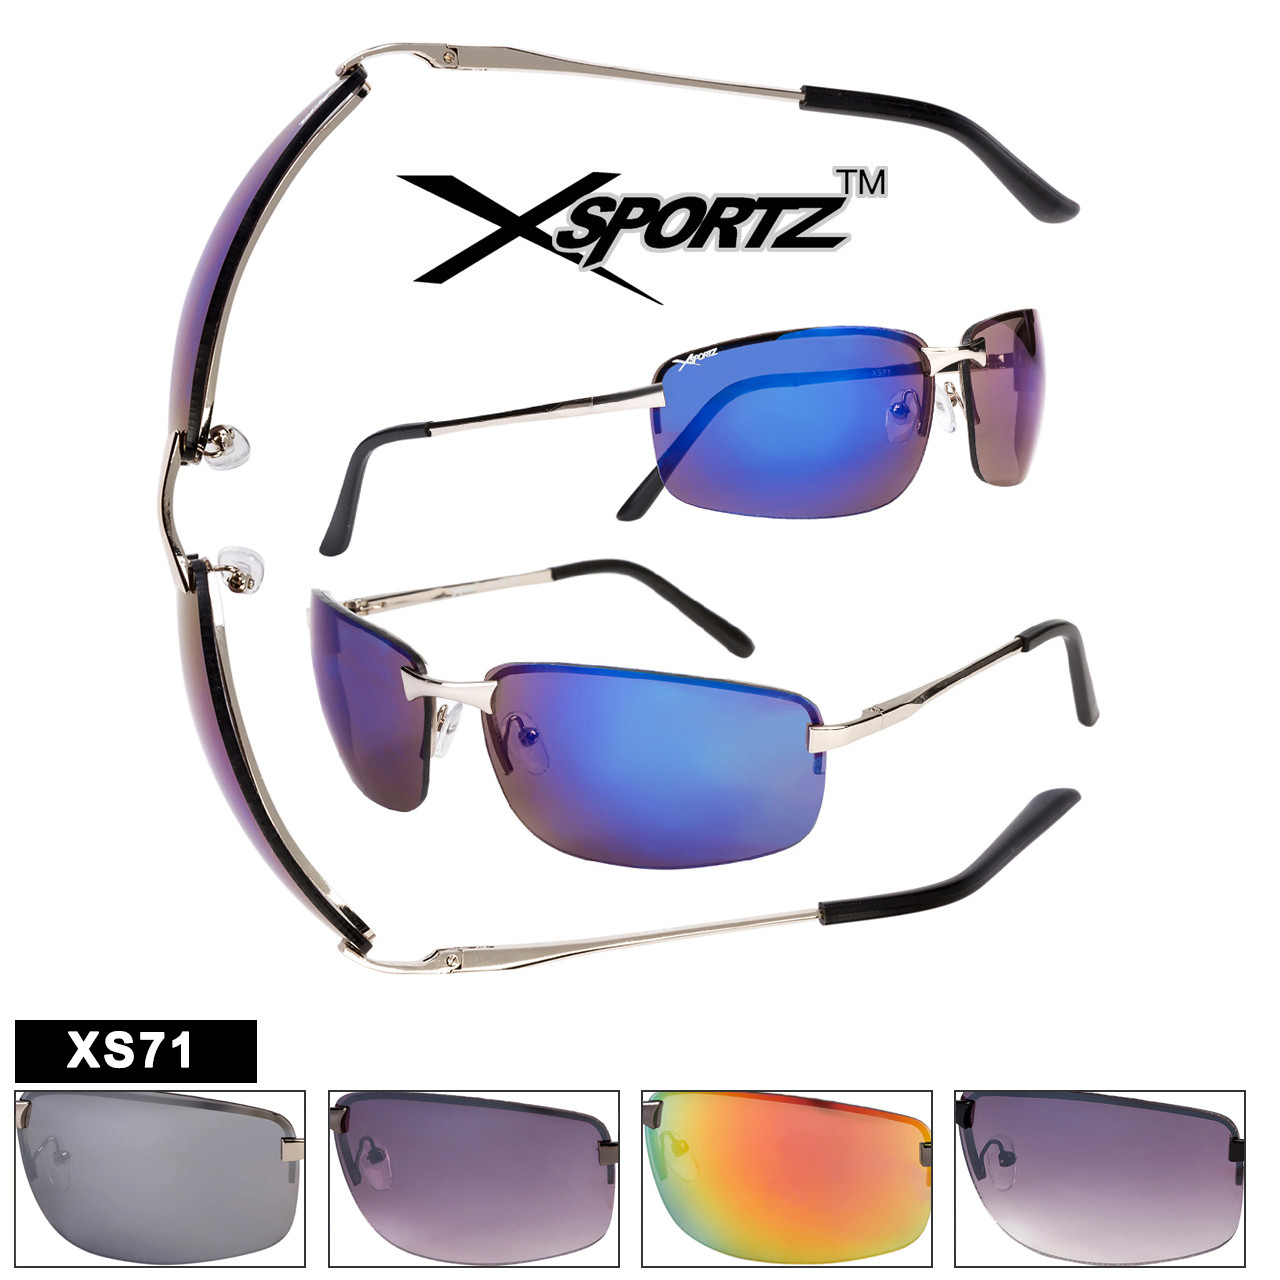 Wholesale Sport Sunglasses - Style XS71